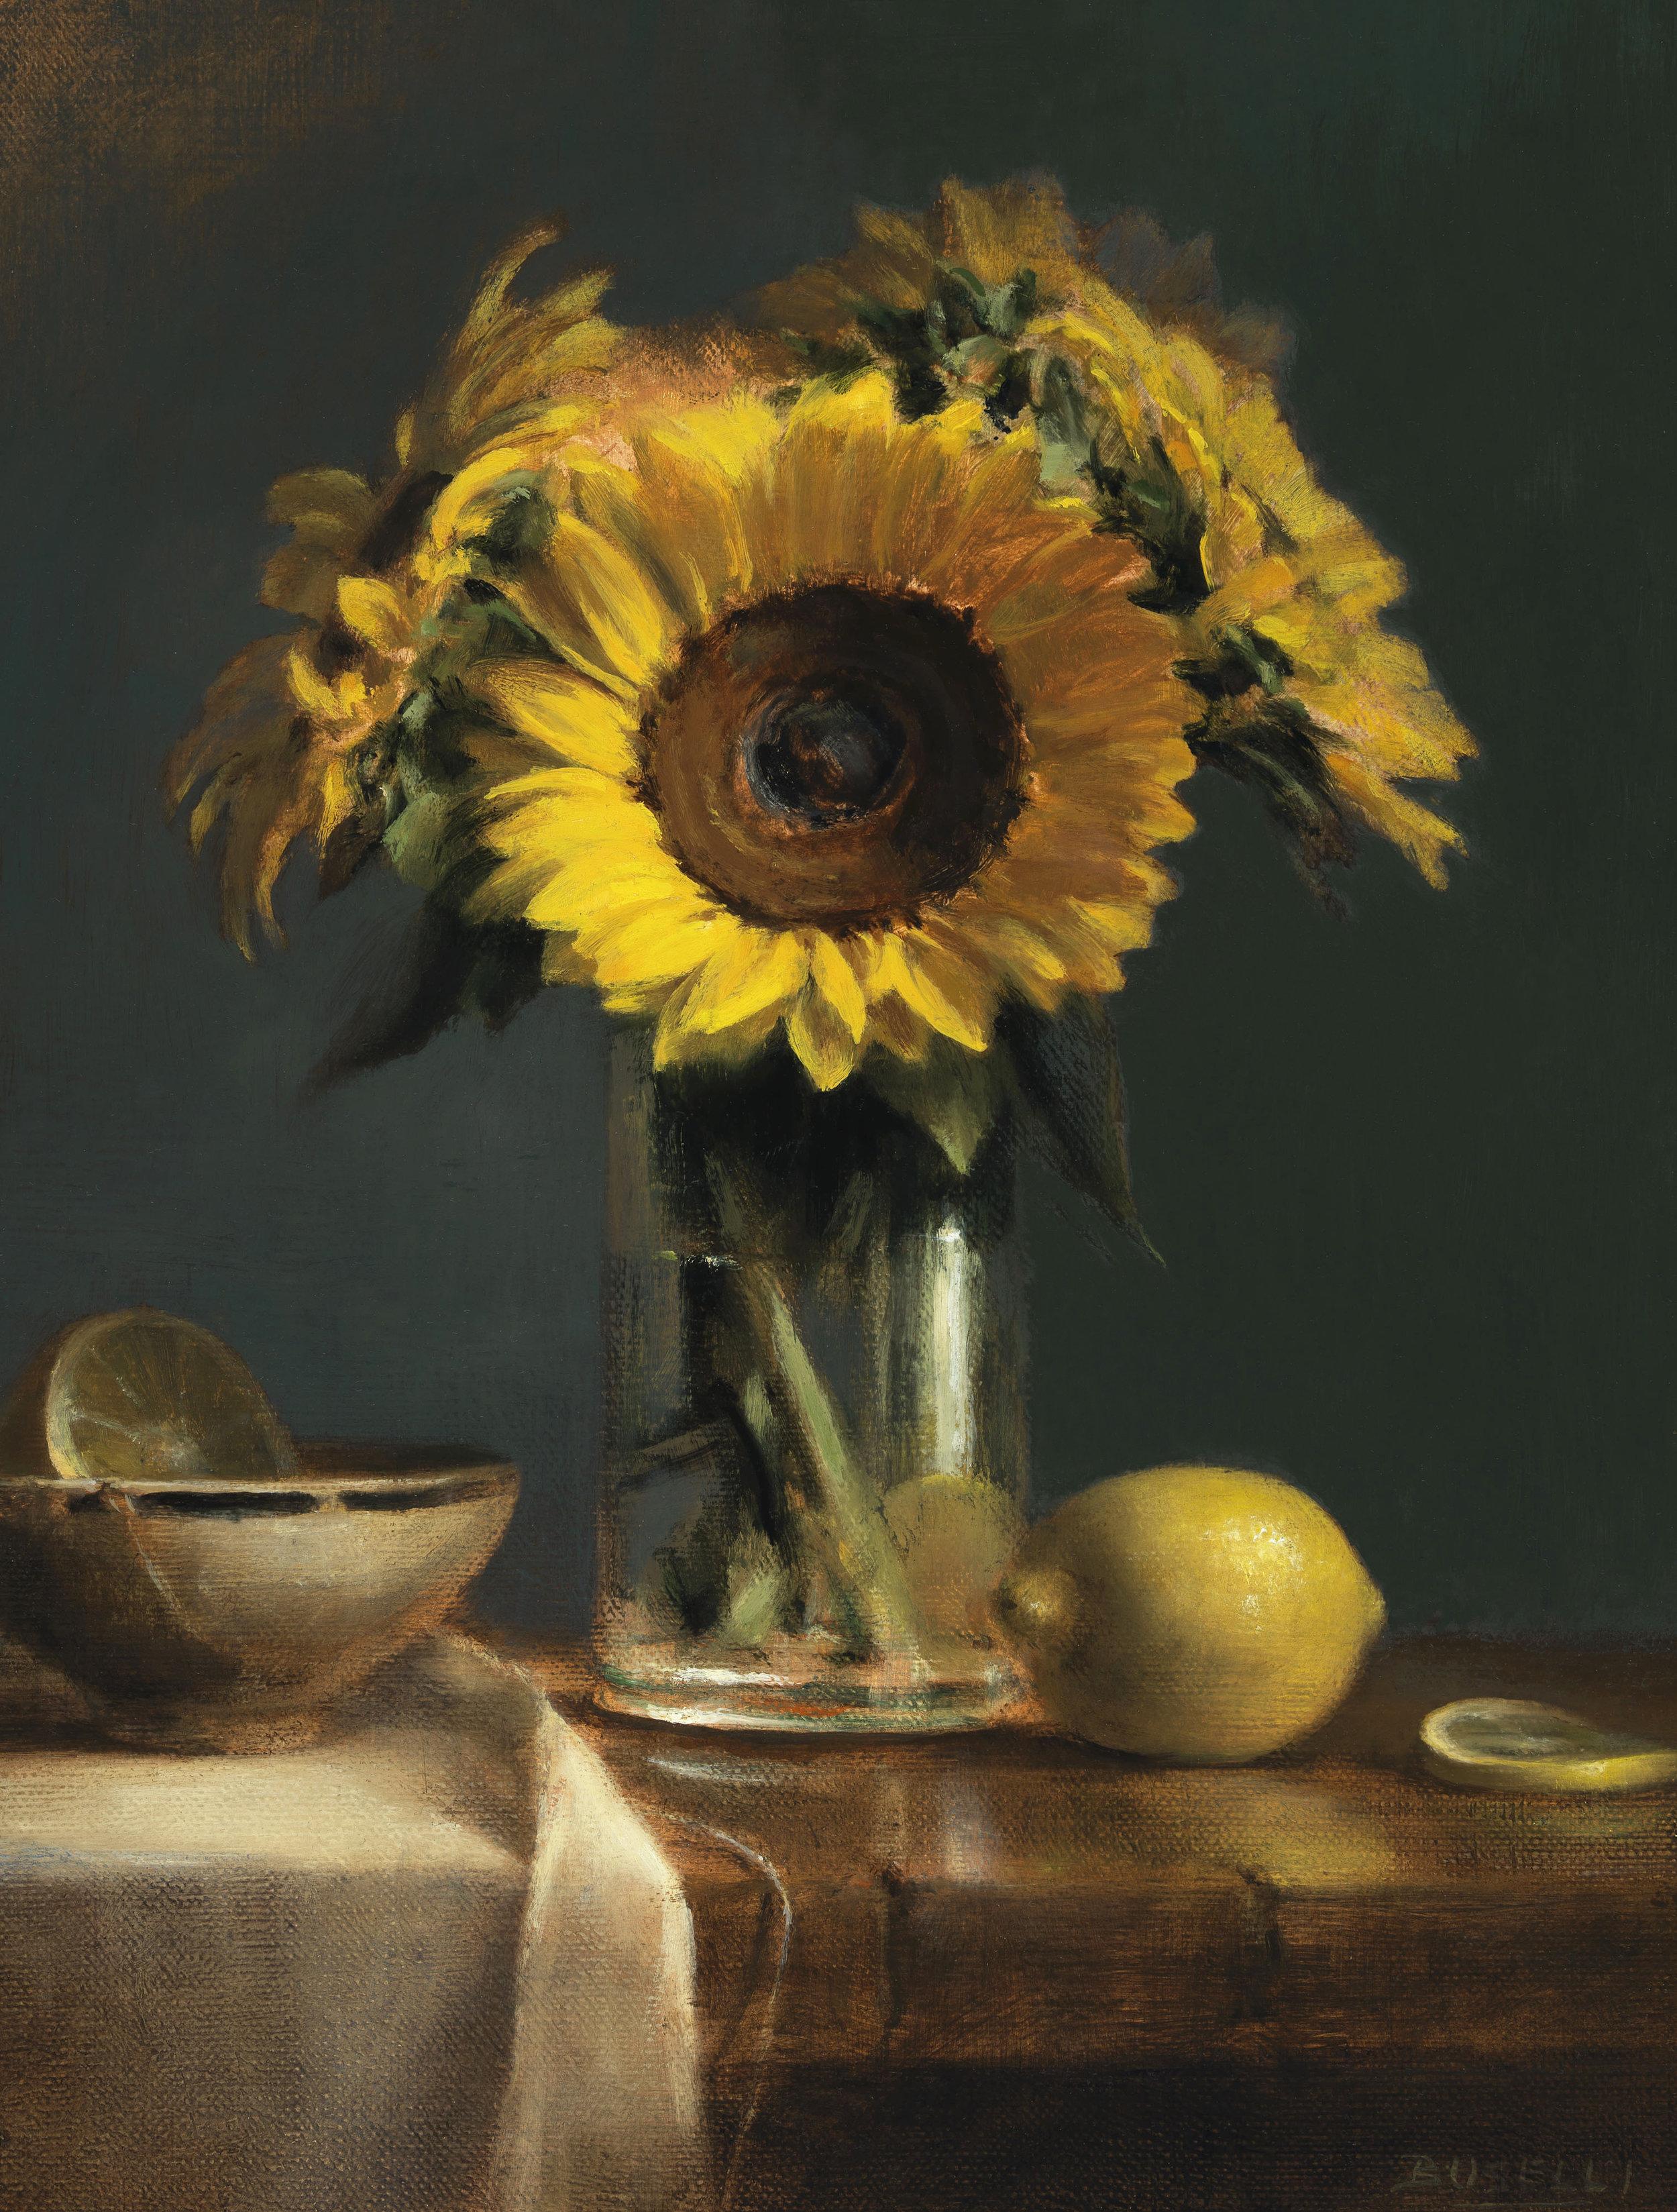 Sunflower with Lemons - AWA Tuscon Image.jpg